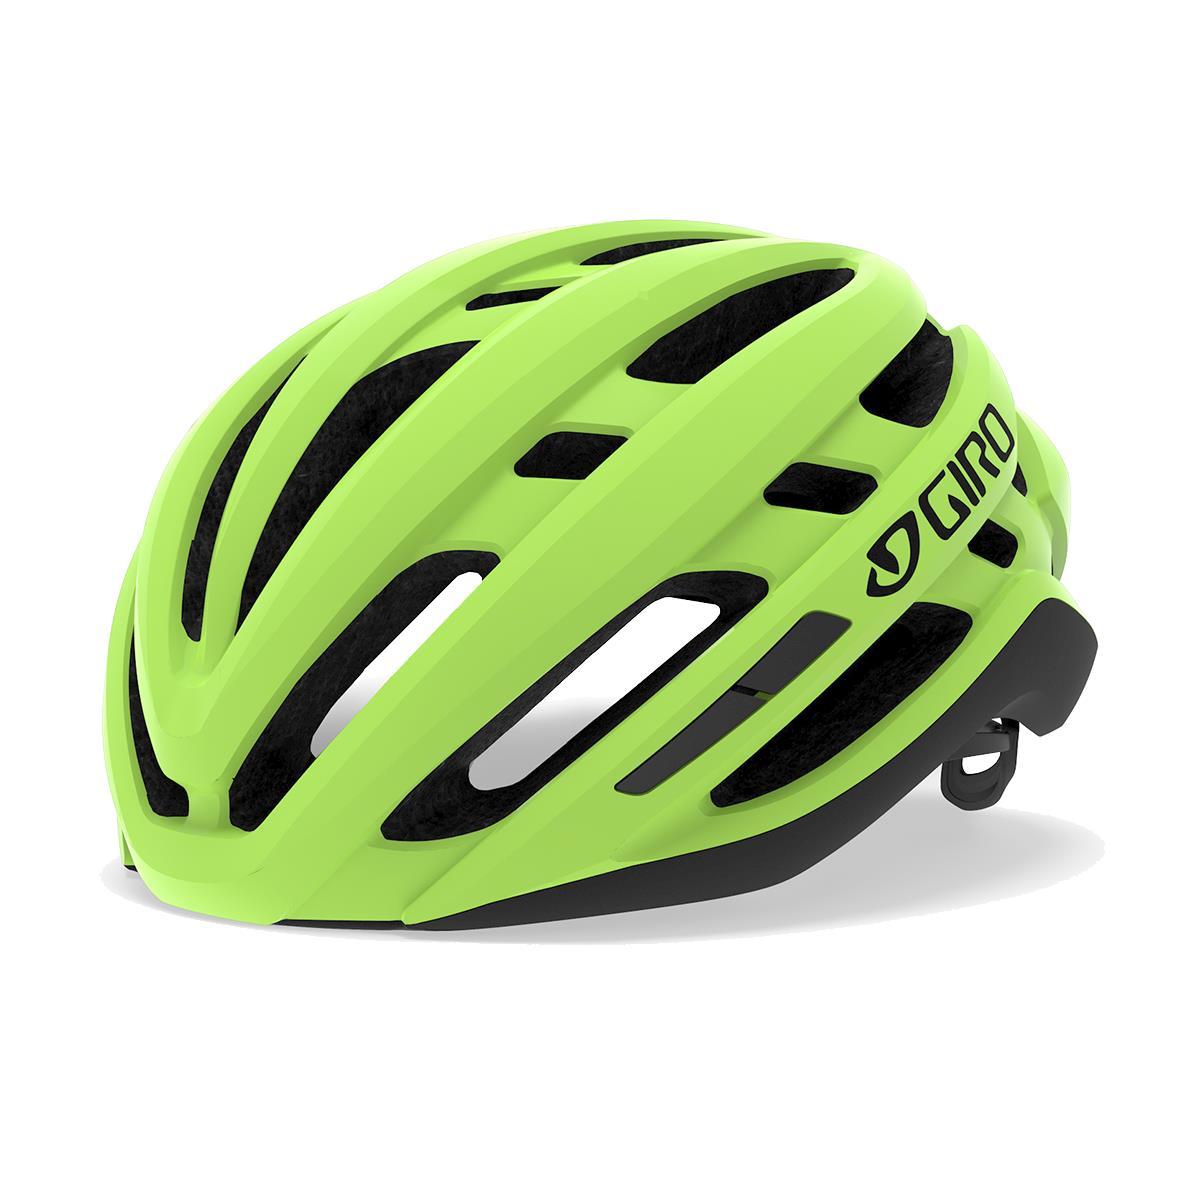 Giro-Agilis-Green-01